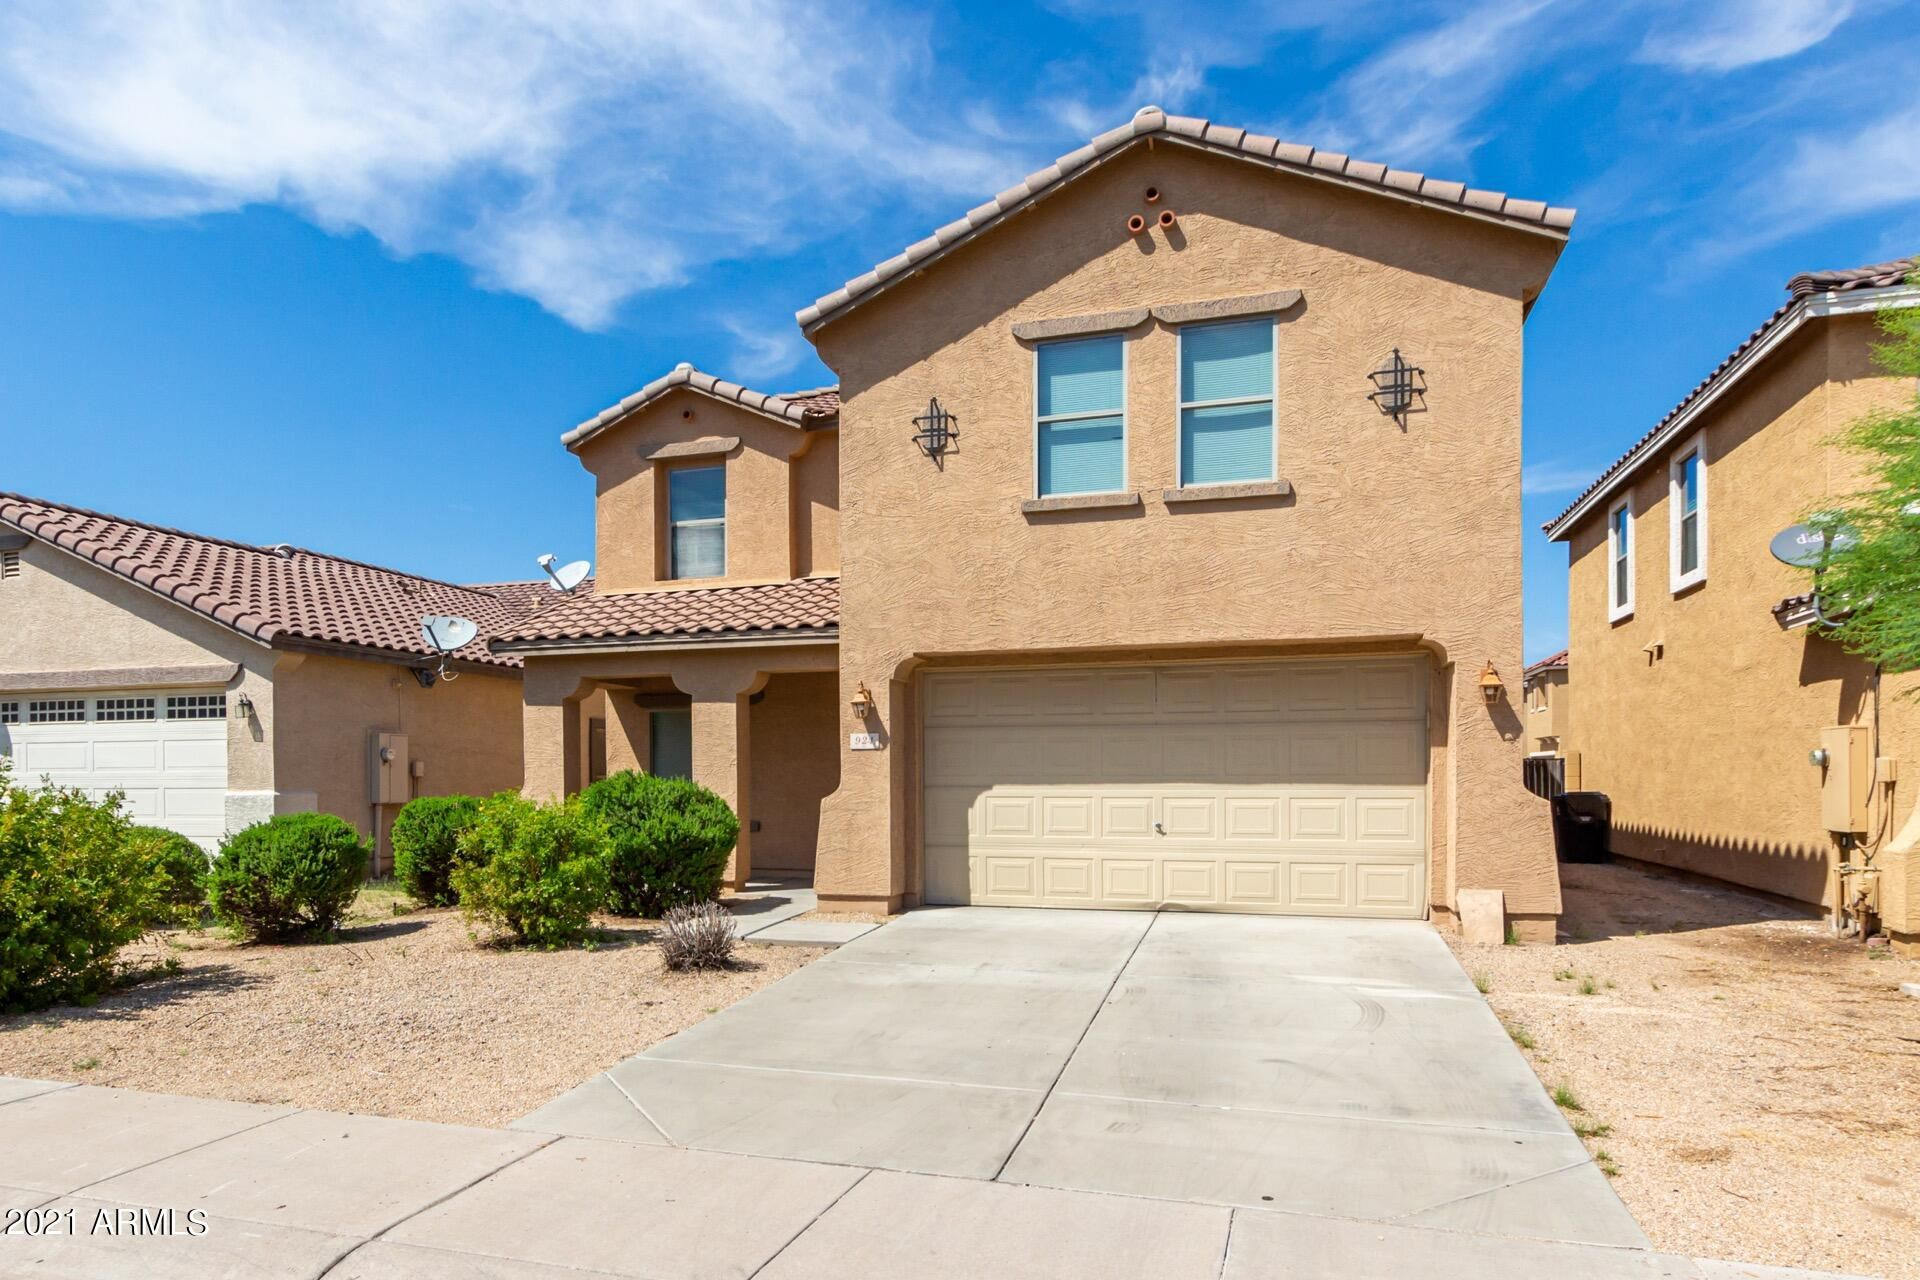 Photo of 924 E CORRALL Street, Avondale, AZ 85323 (MLS # 6291572)